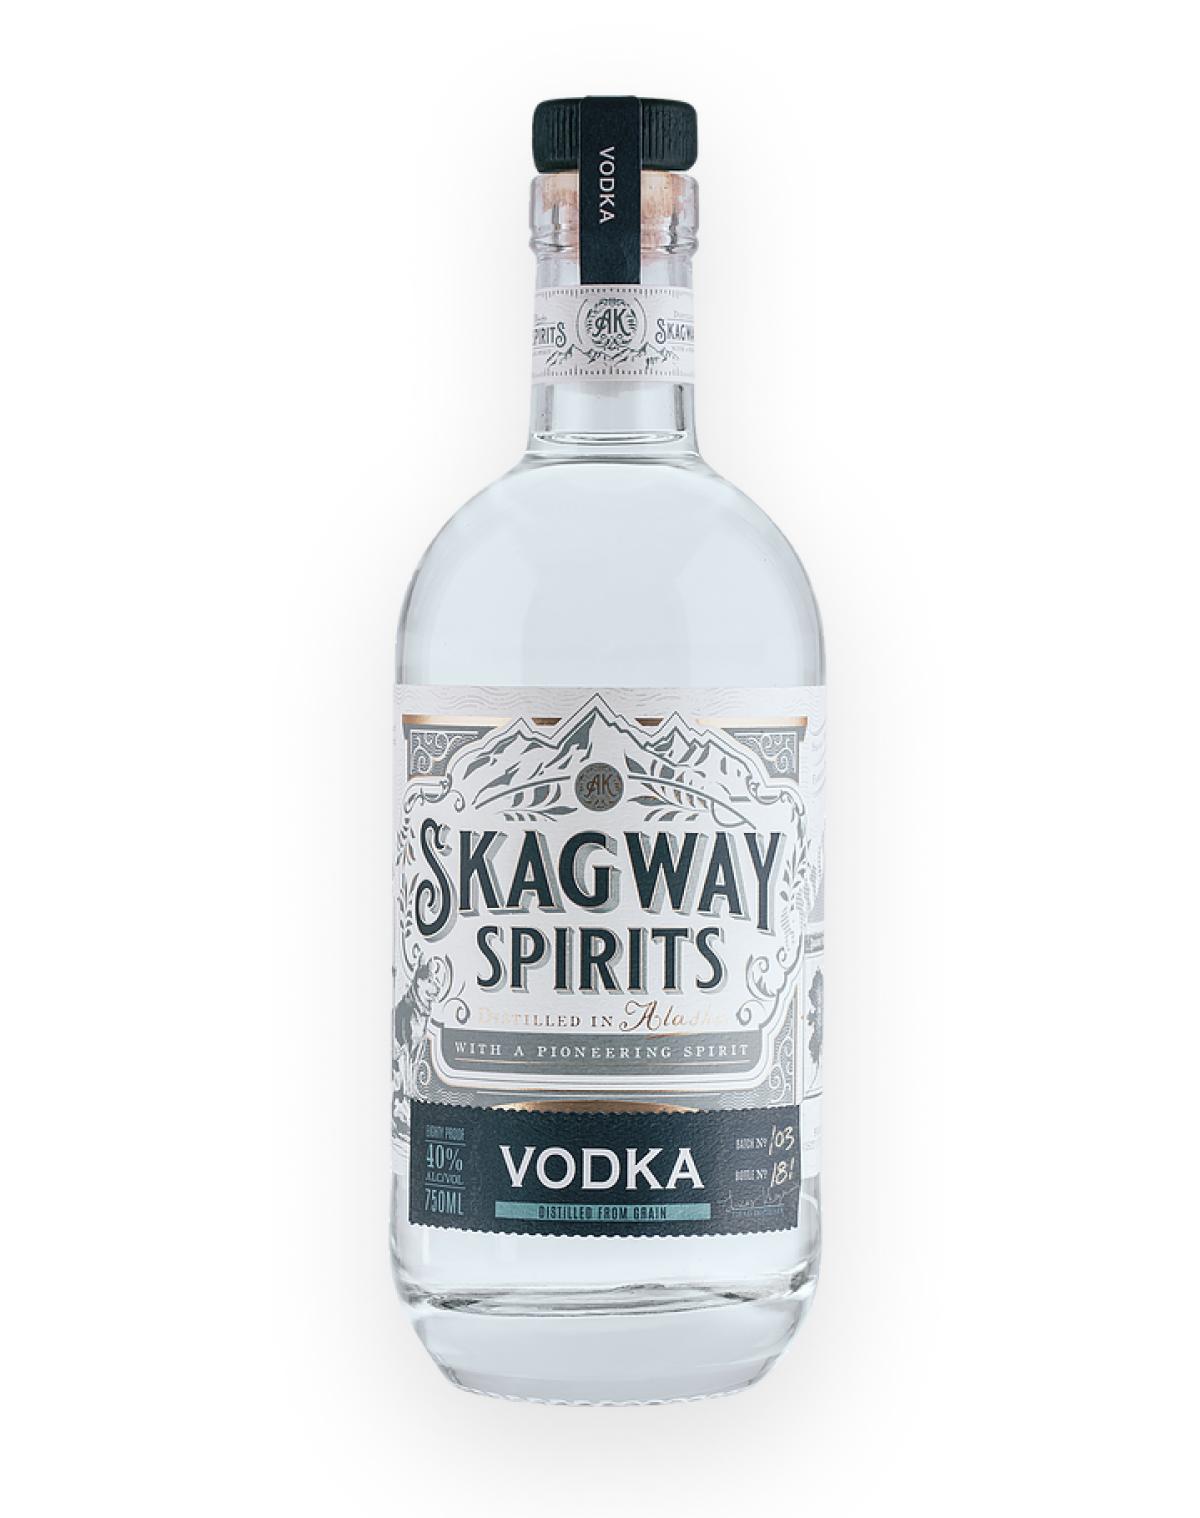 A beautiful bottle of Glacial Vodka